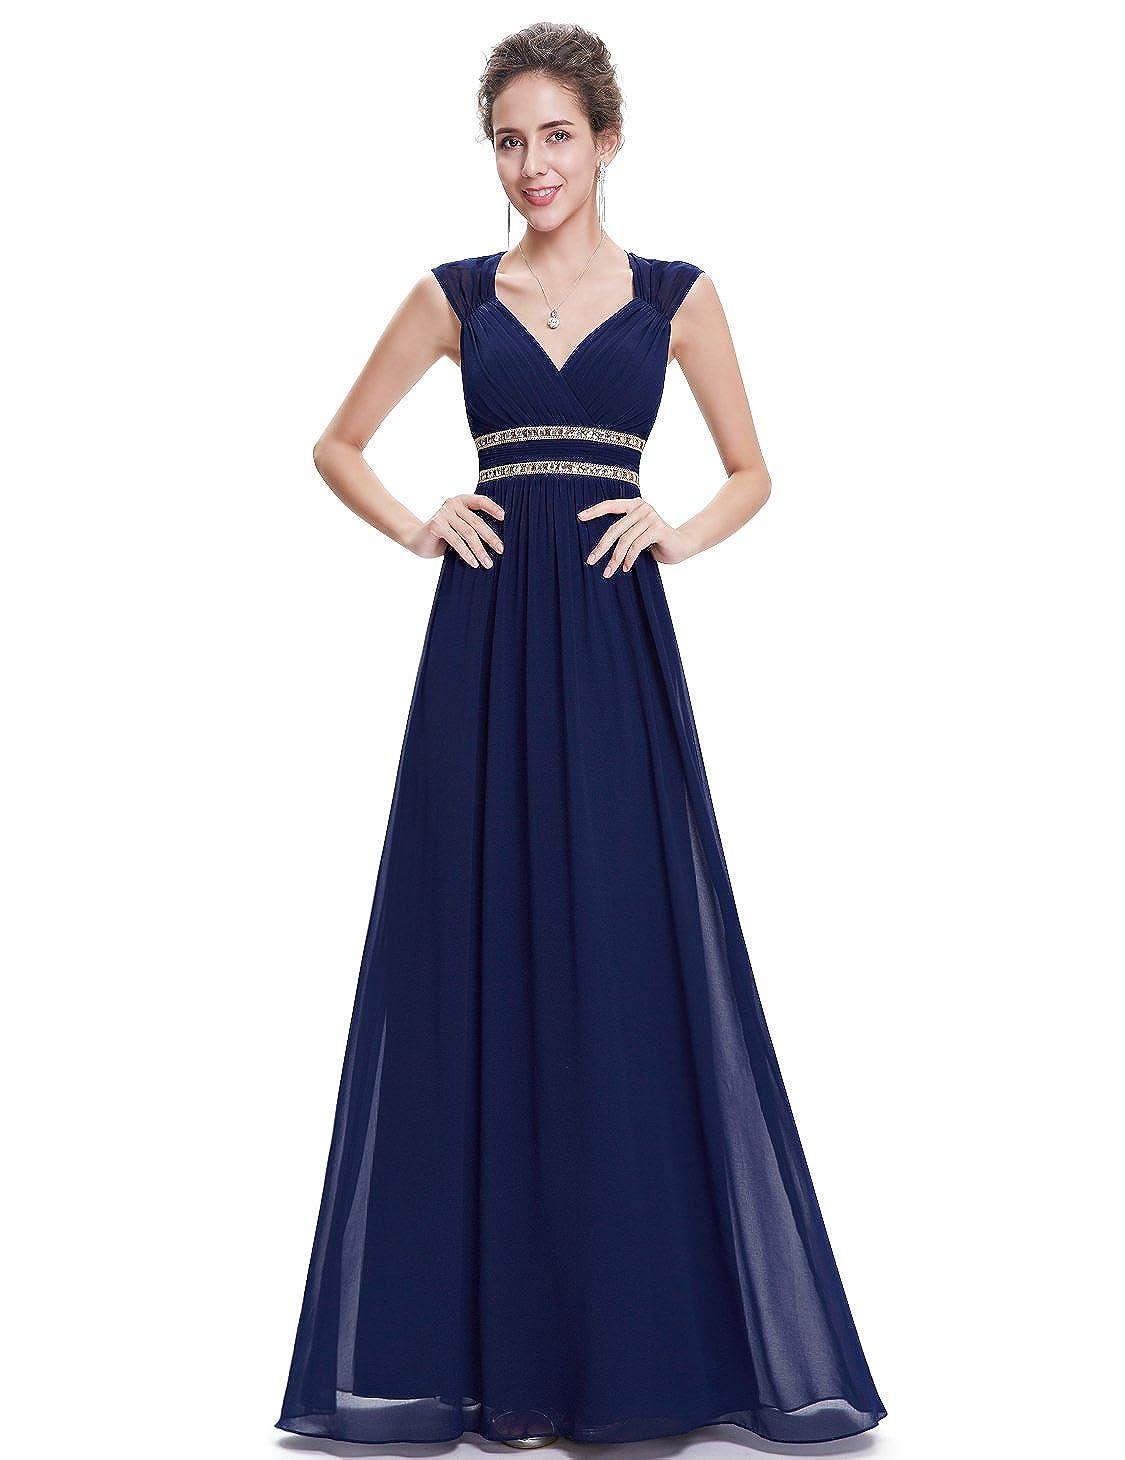 Ever Pretty Womens Elegant V-Neck Long Evening Dress 08697: Amazon.co.uk: Clothing